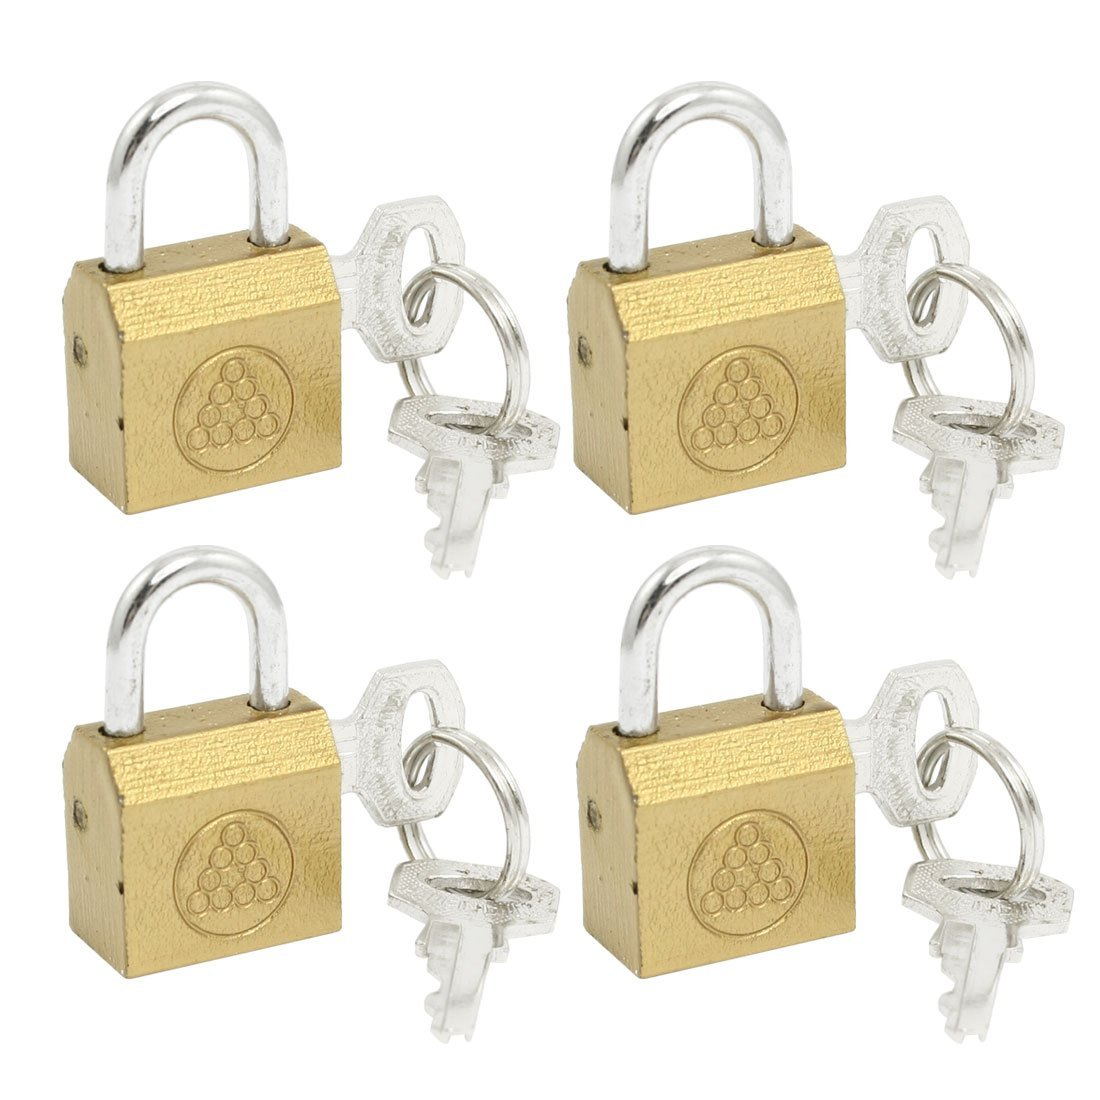 uxcell 4 Pcs Cabinet Jewlery Box Drawer Safety Brass Padlock Keys Set